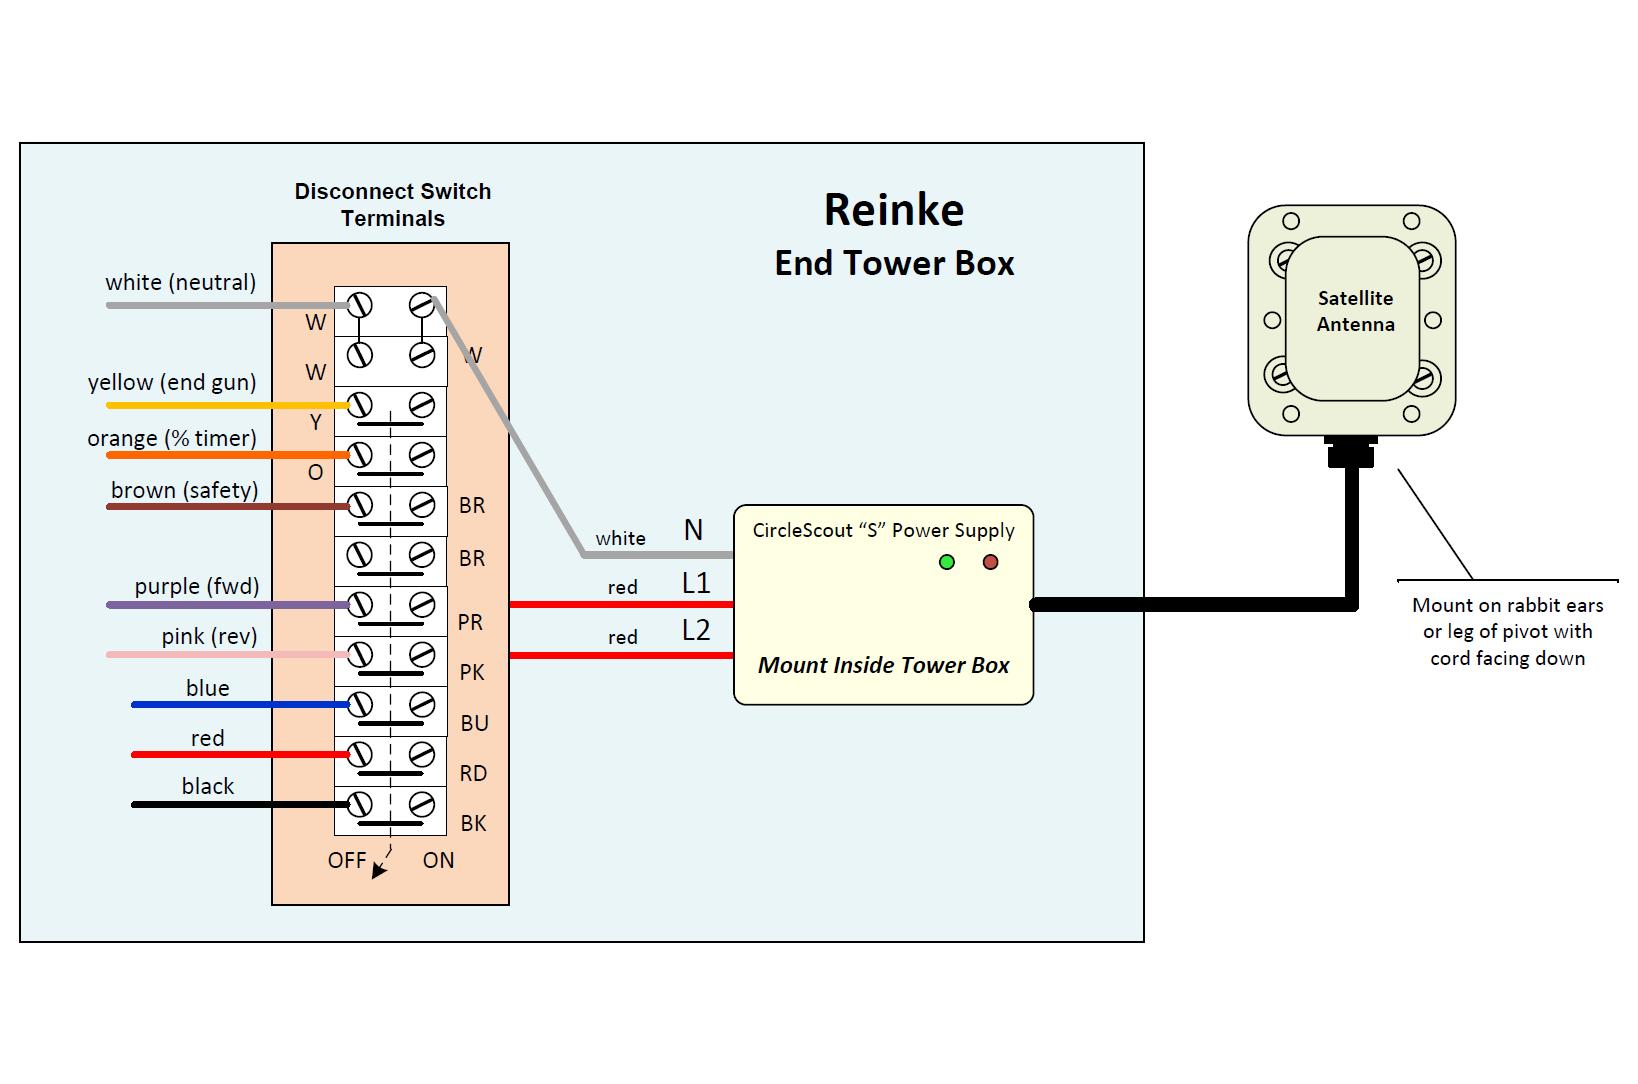 Reinke Wiring Diagram Layout Diagrams Irrigation For Circlescout S 2018 Satellite Version Net Rh Help Netirrigate Com Symbols